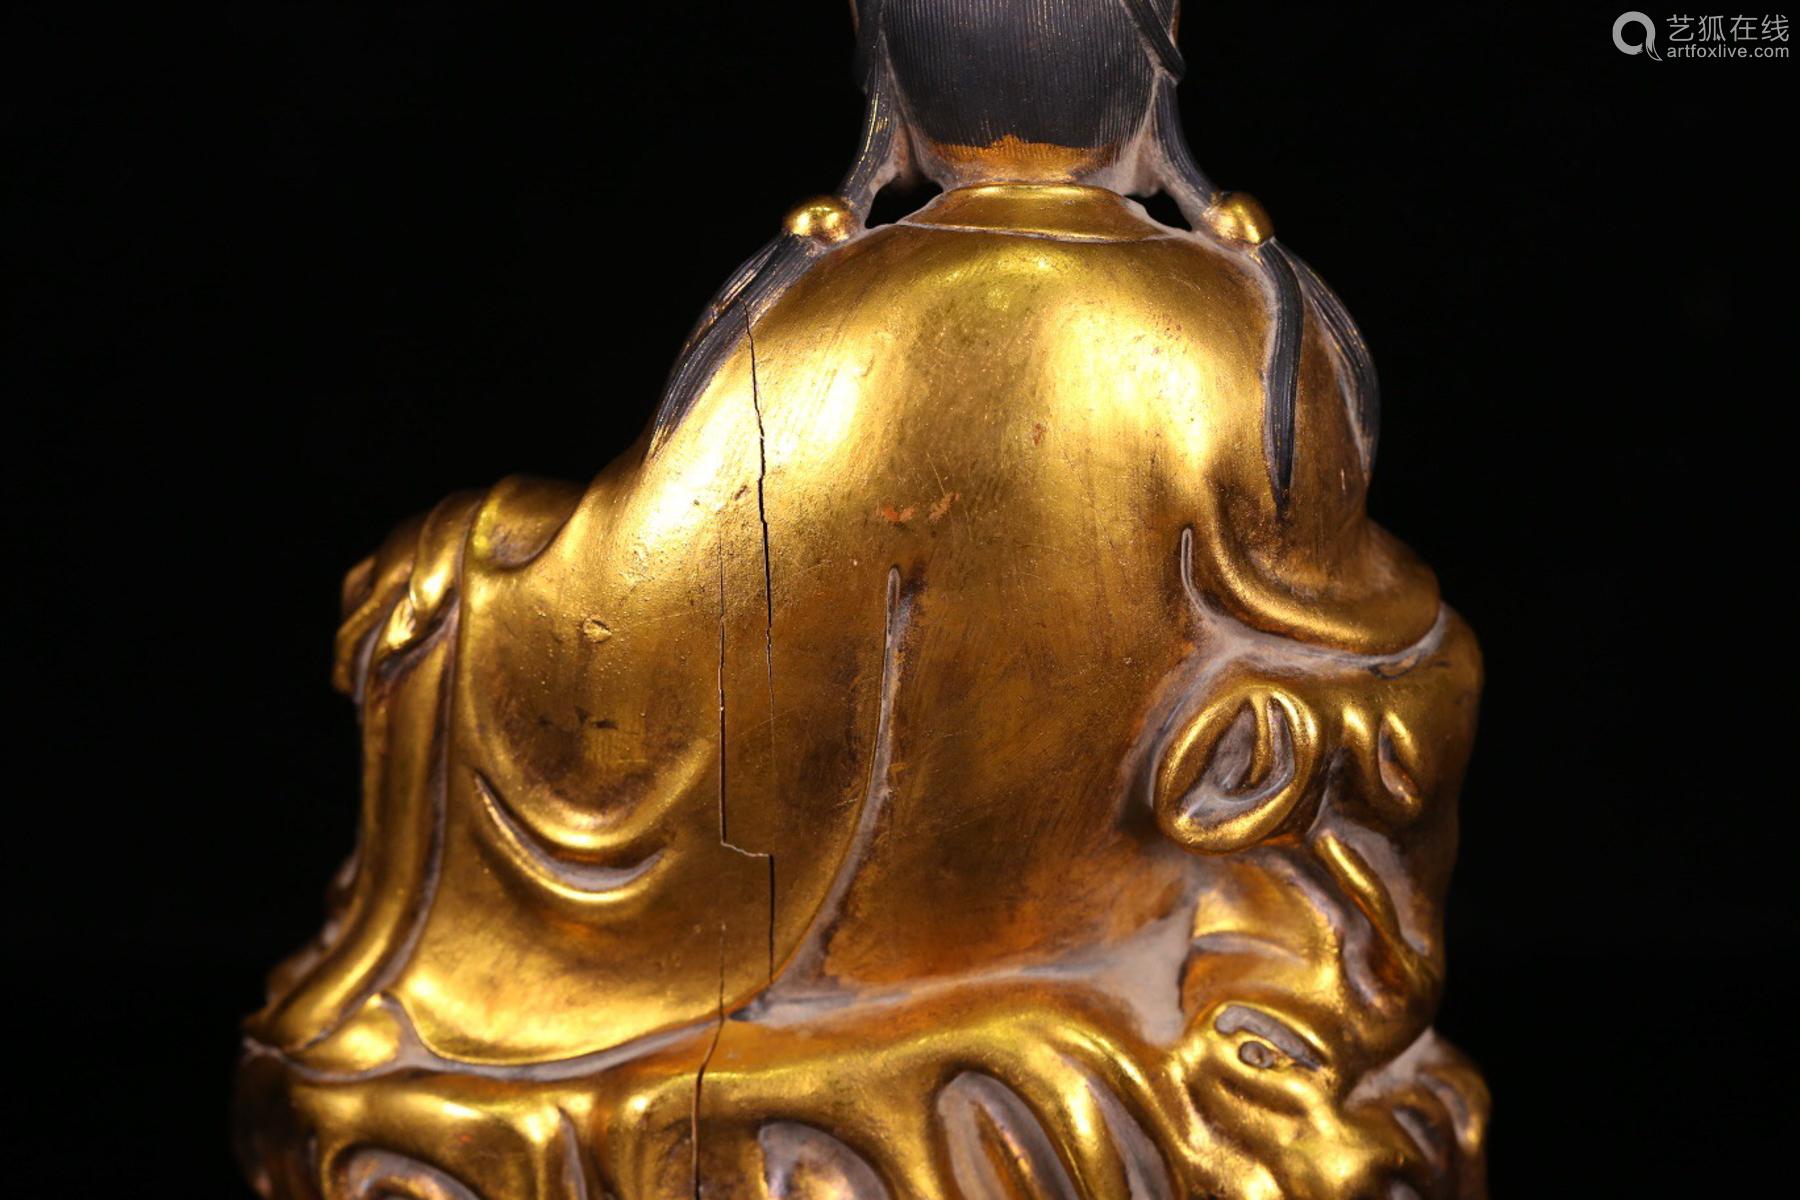 A GILT BRONZE CASTED GUANYIN BUDDHA